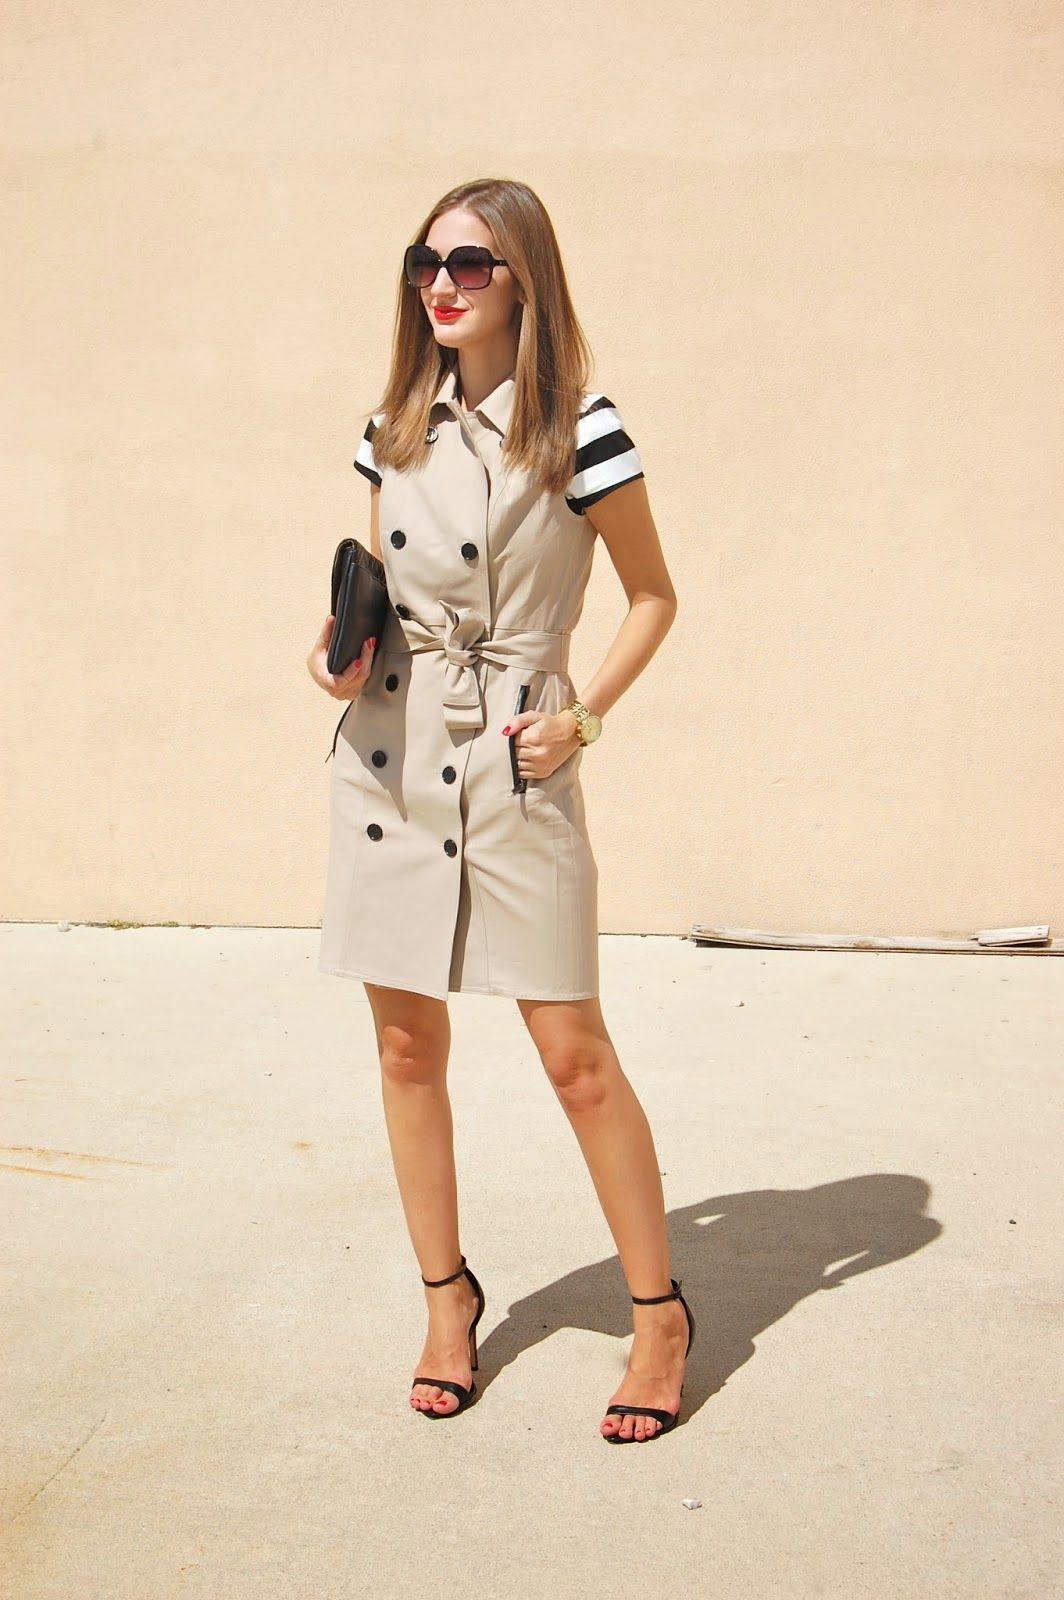 3b175330ef4f Wearing Ann Taylor Sleeveless Trench Coat, Striped Top Sleeveless Trench  Coat, Trench Coat Dress